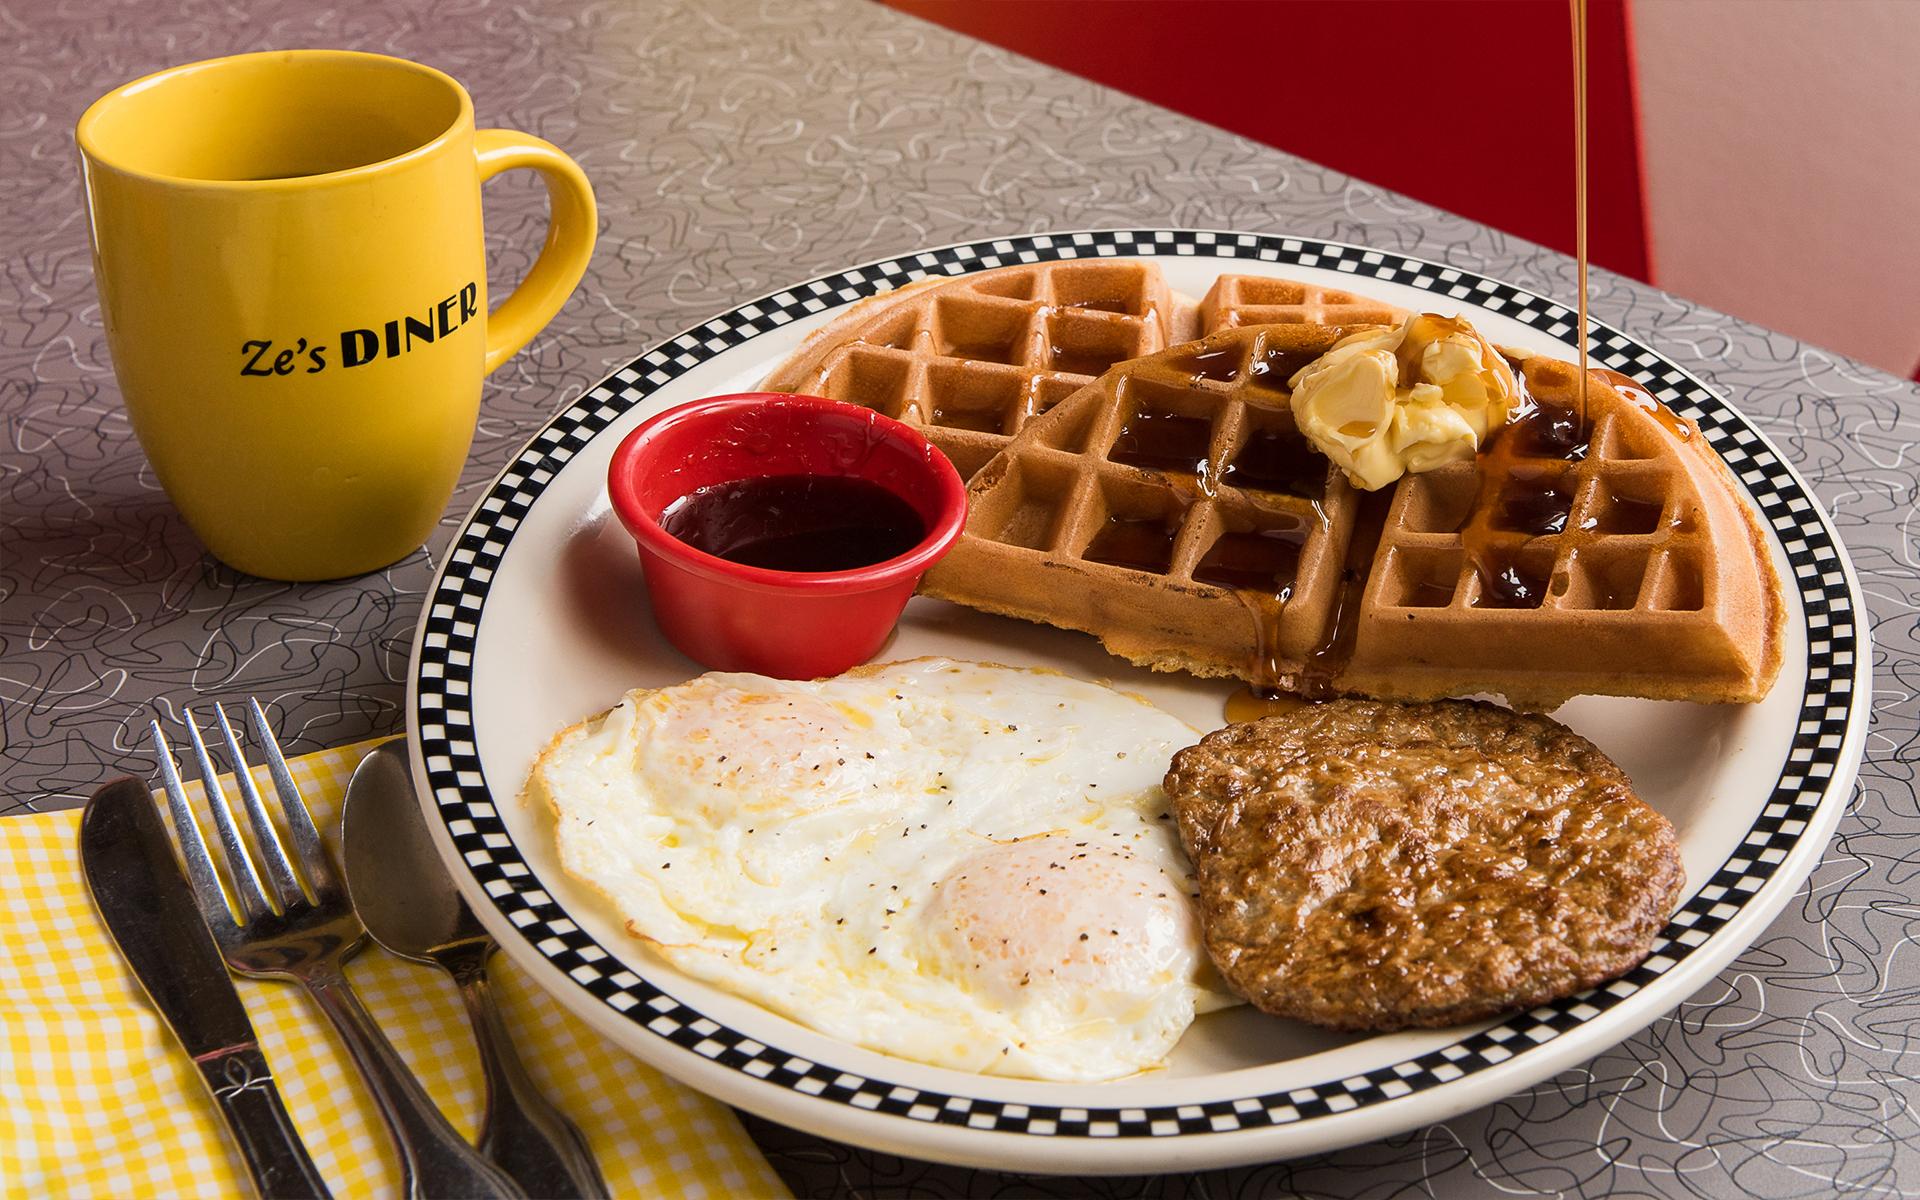 Eggs, Waffles, Sausage, Breakfast & Coffee